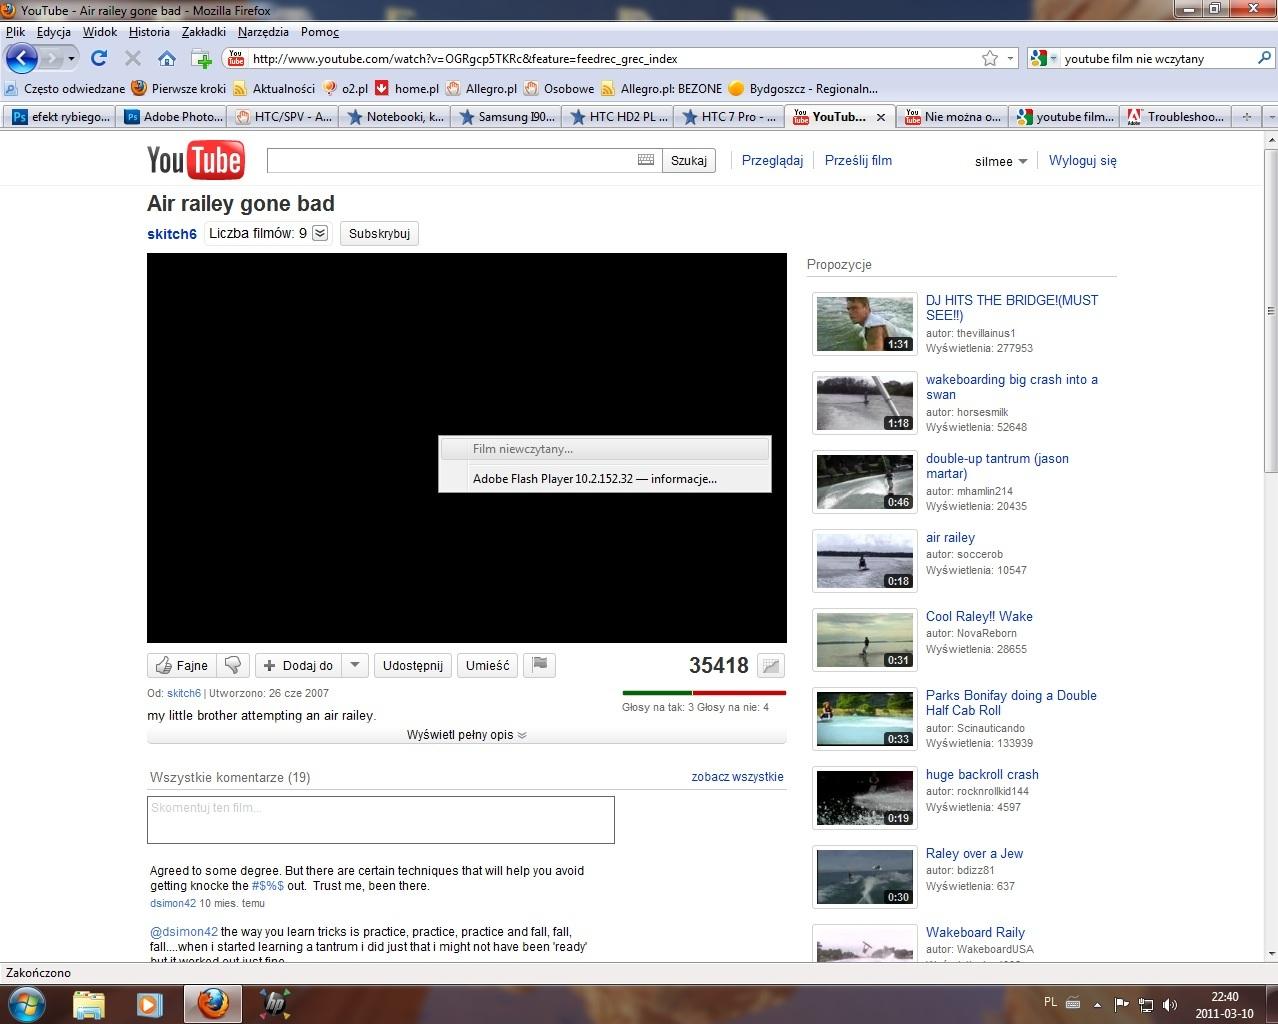 Mozzila Firefox 3.6.15 - Youtube